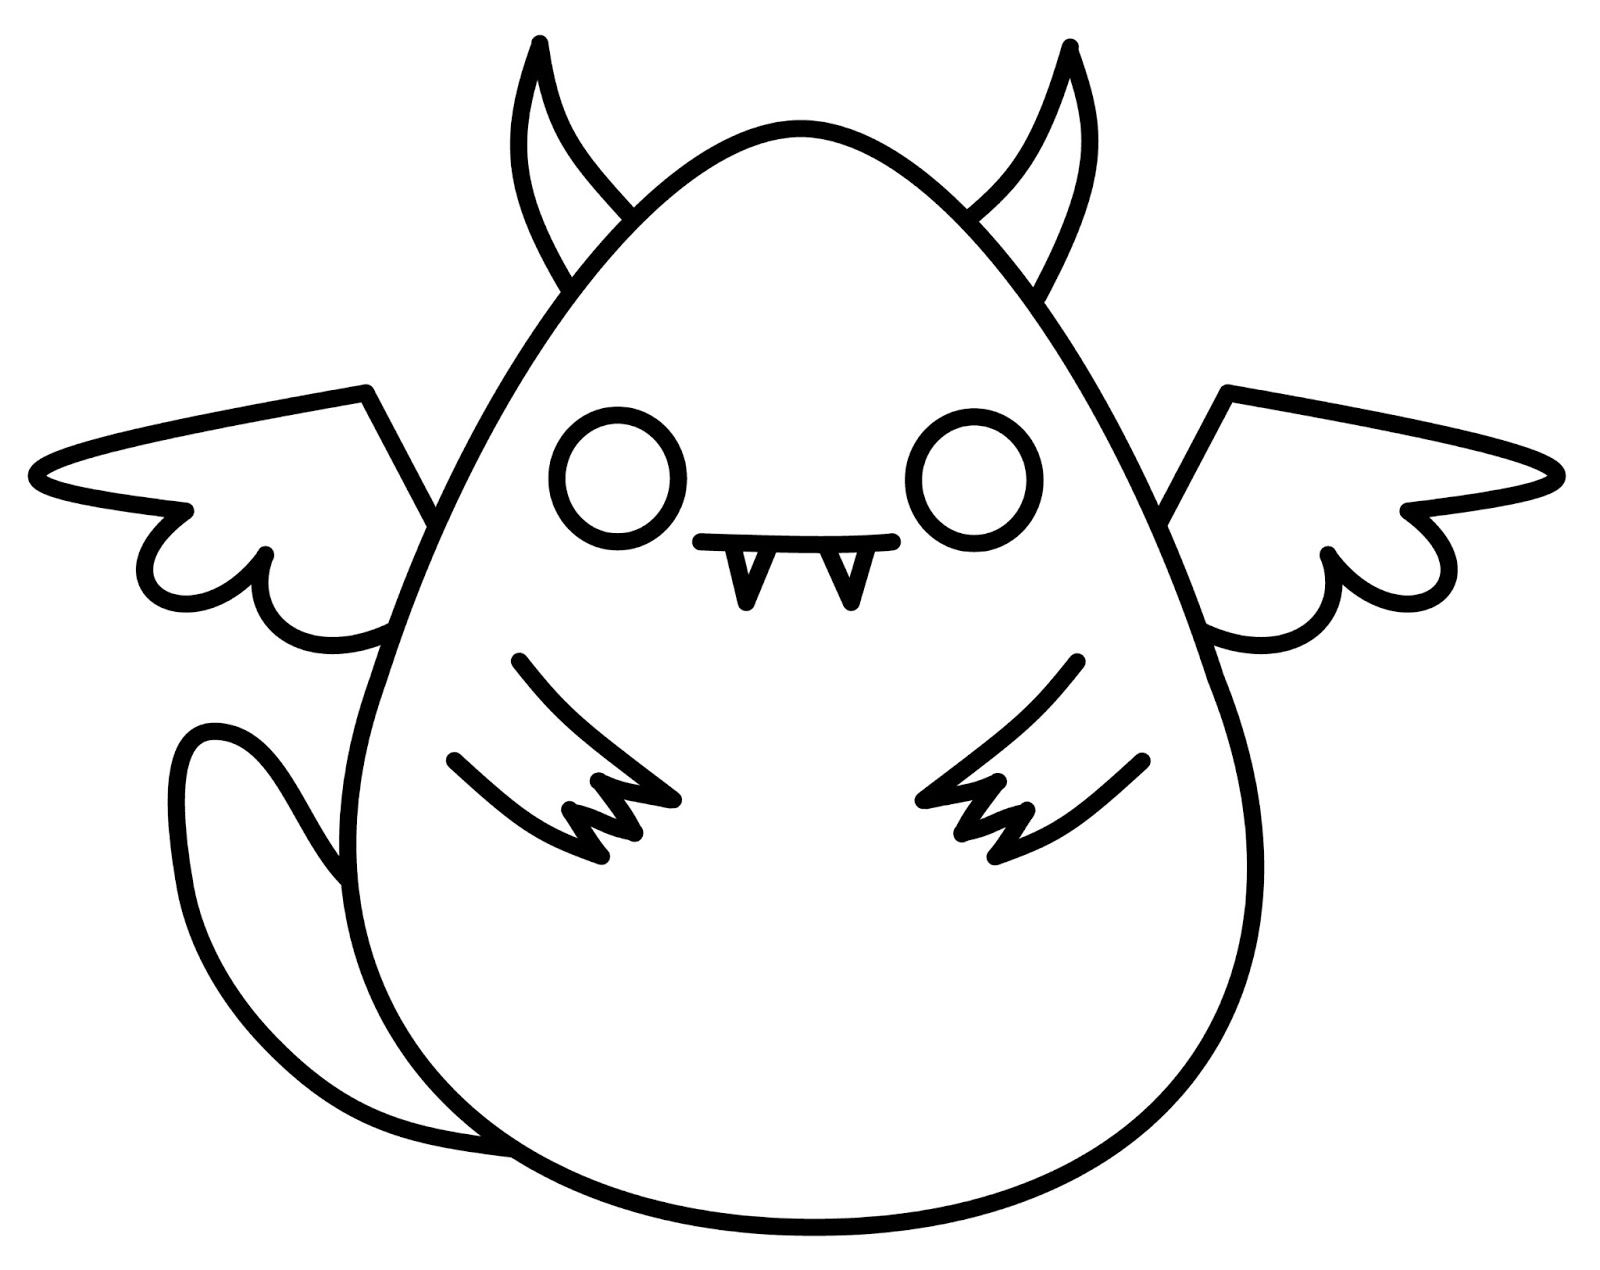 1600x1270 Cute N Kawaii How To Draw A Kawaii Monster Drawing